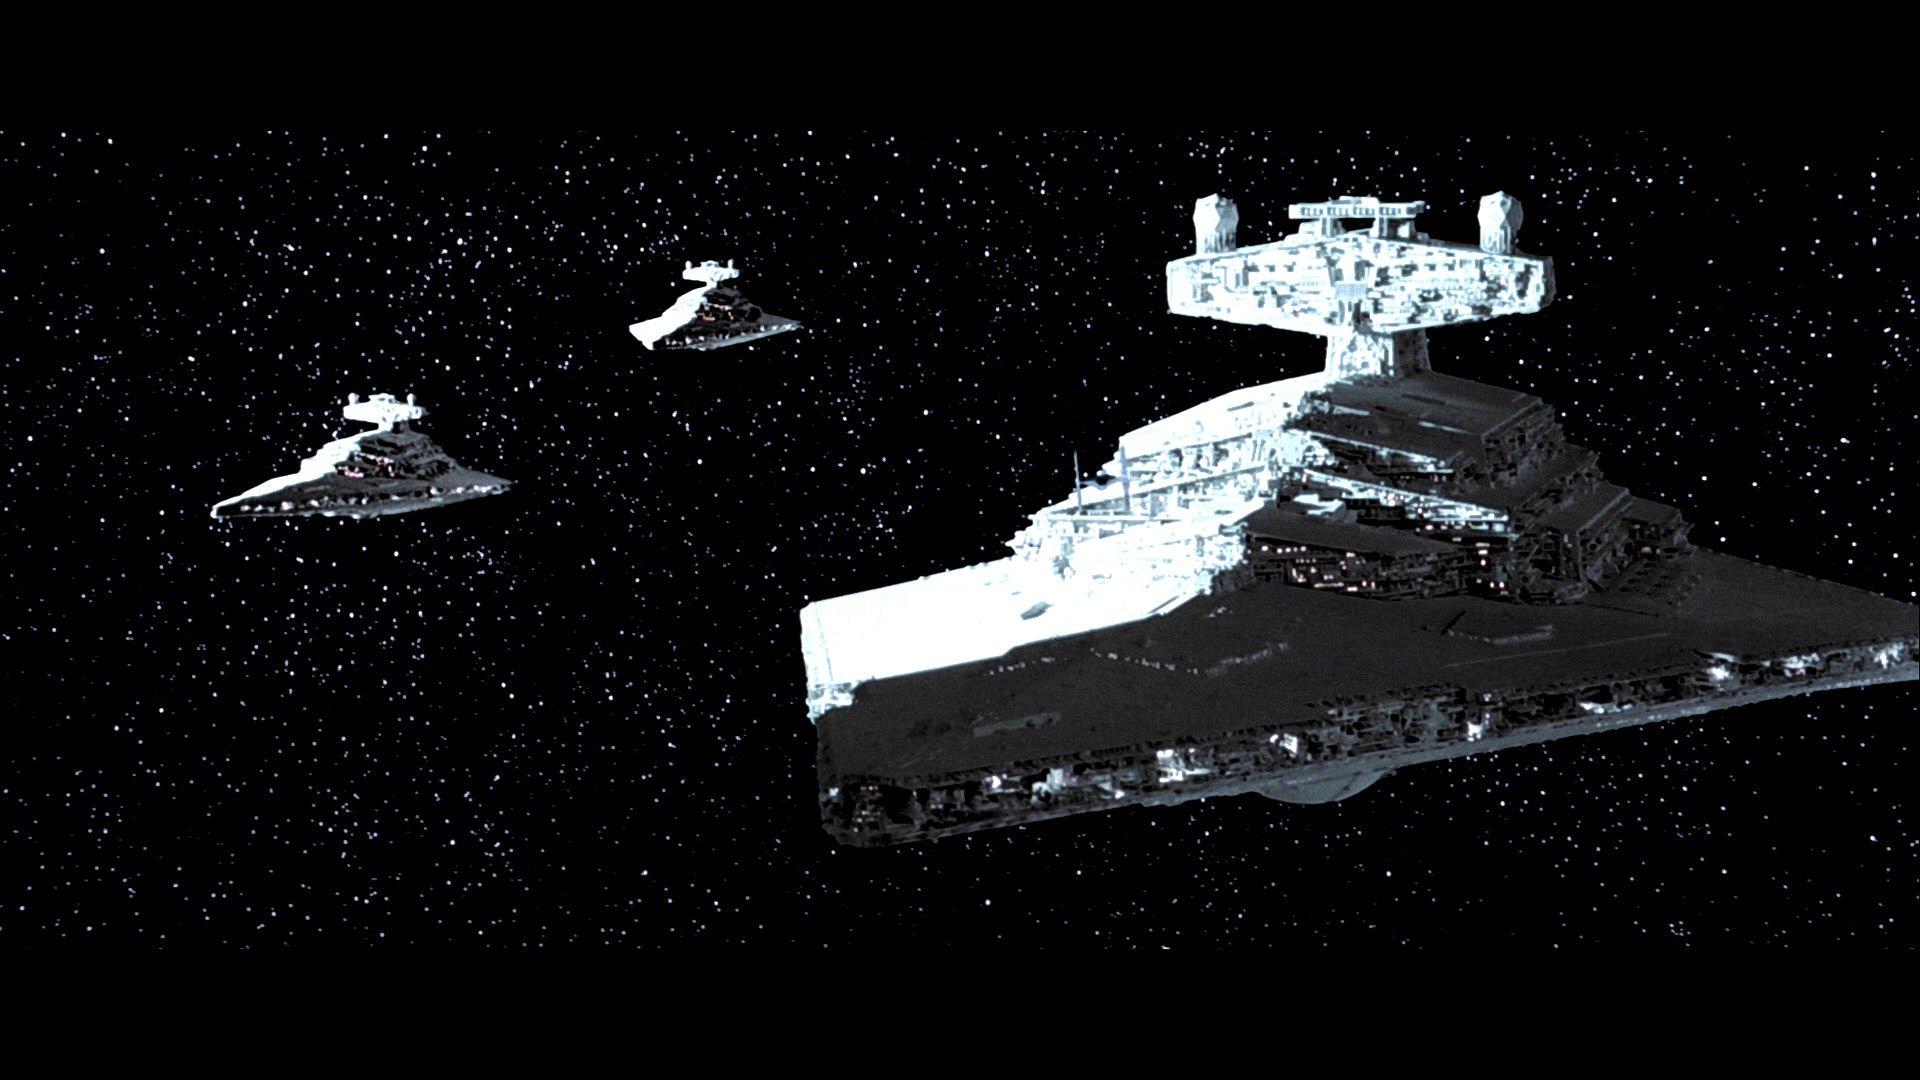 star wars empire wallpaper hd - photo #28